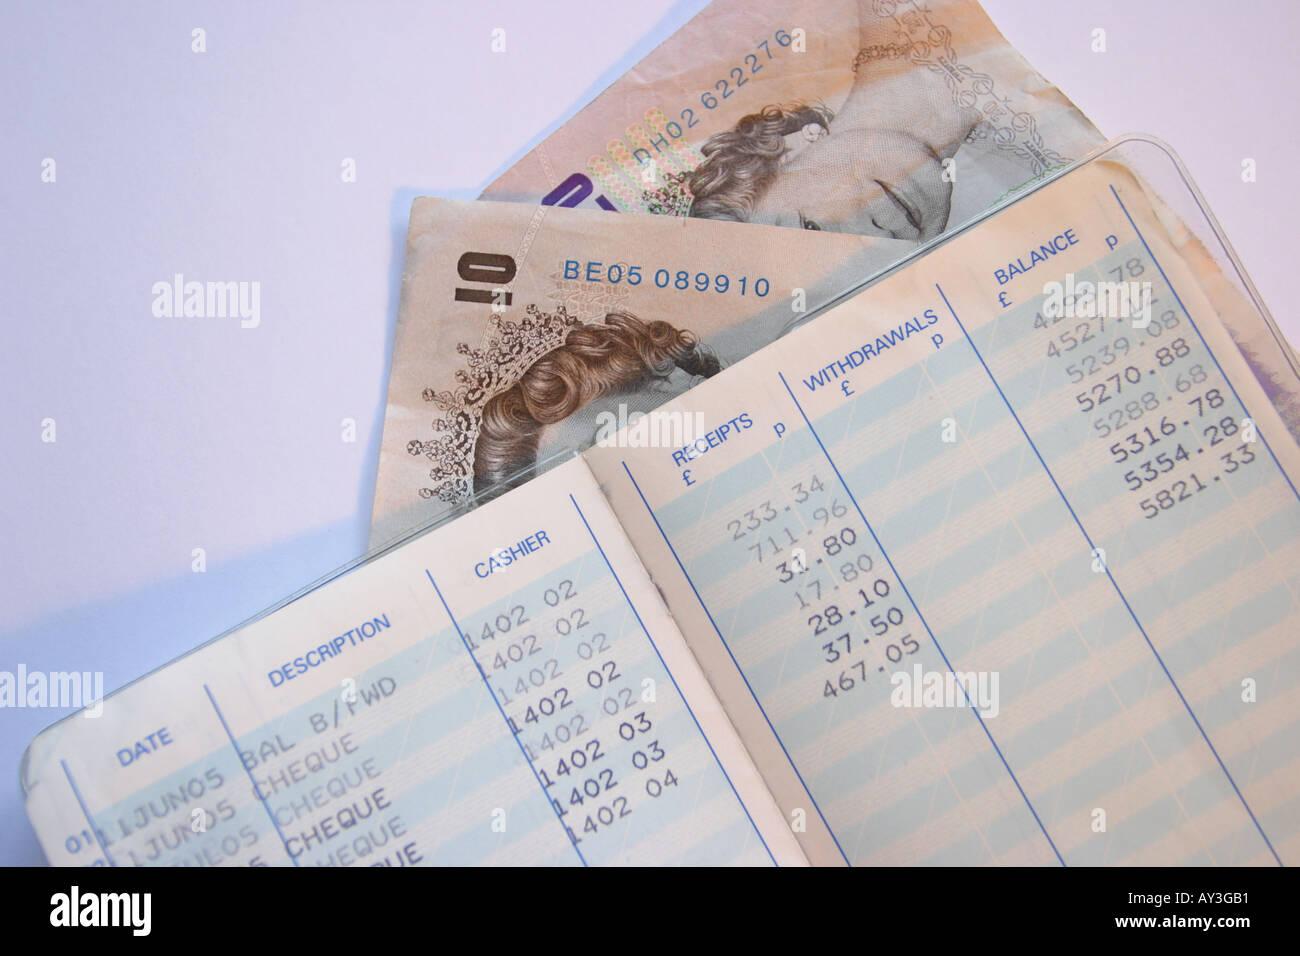 Building Society savings account book - Stock Image